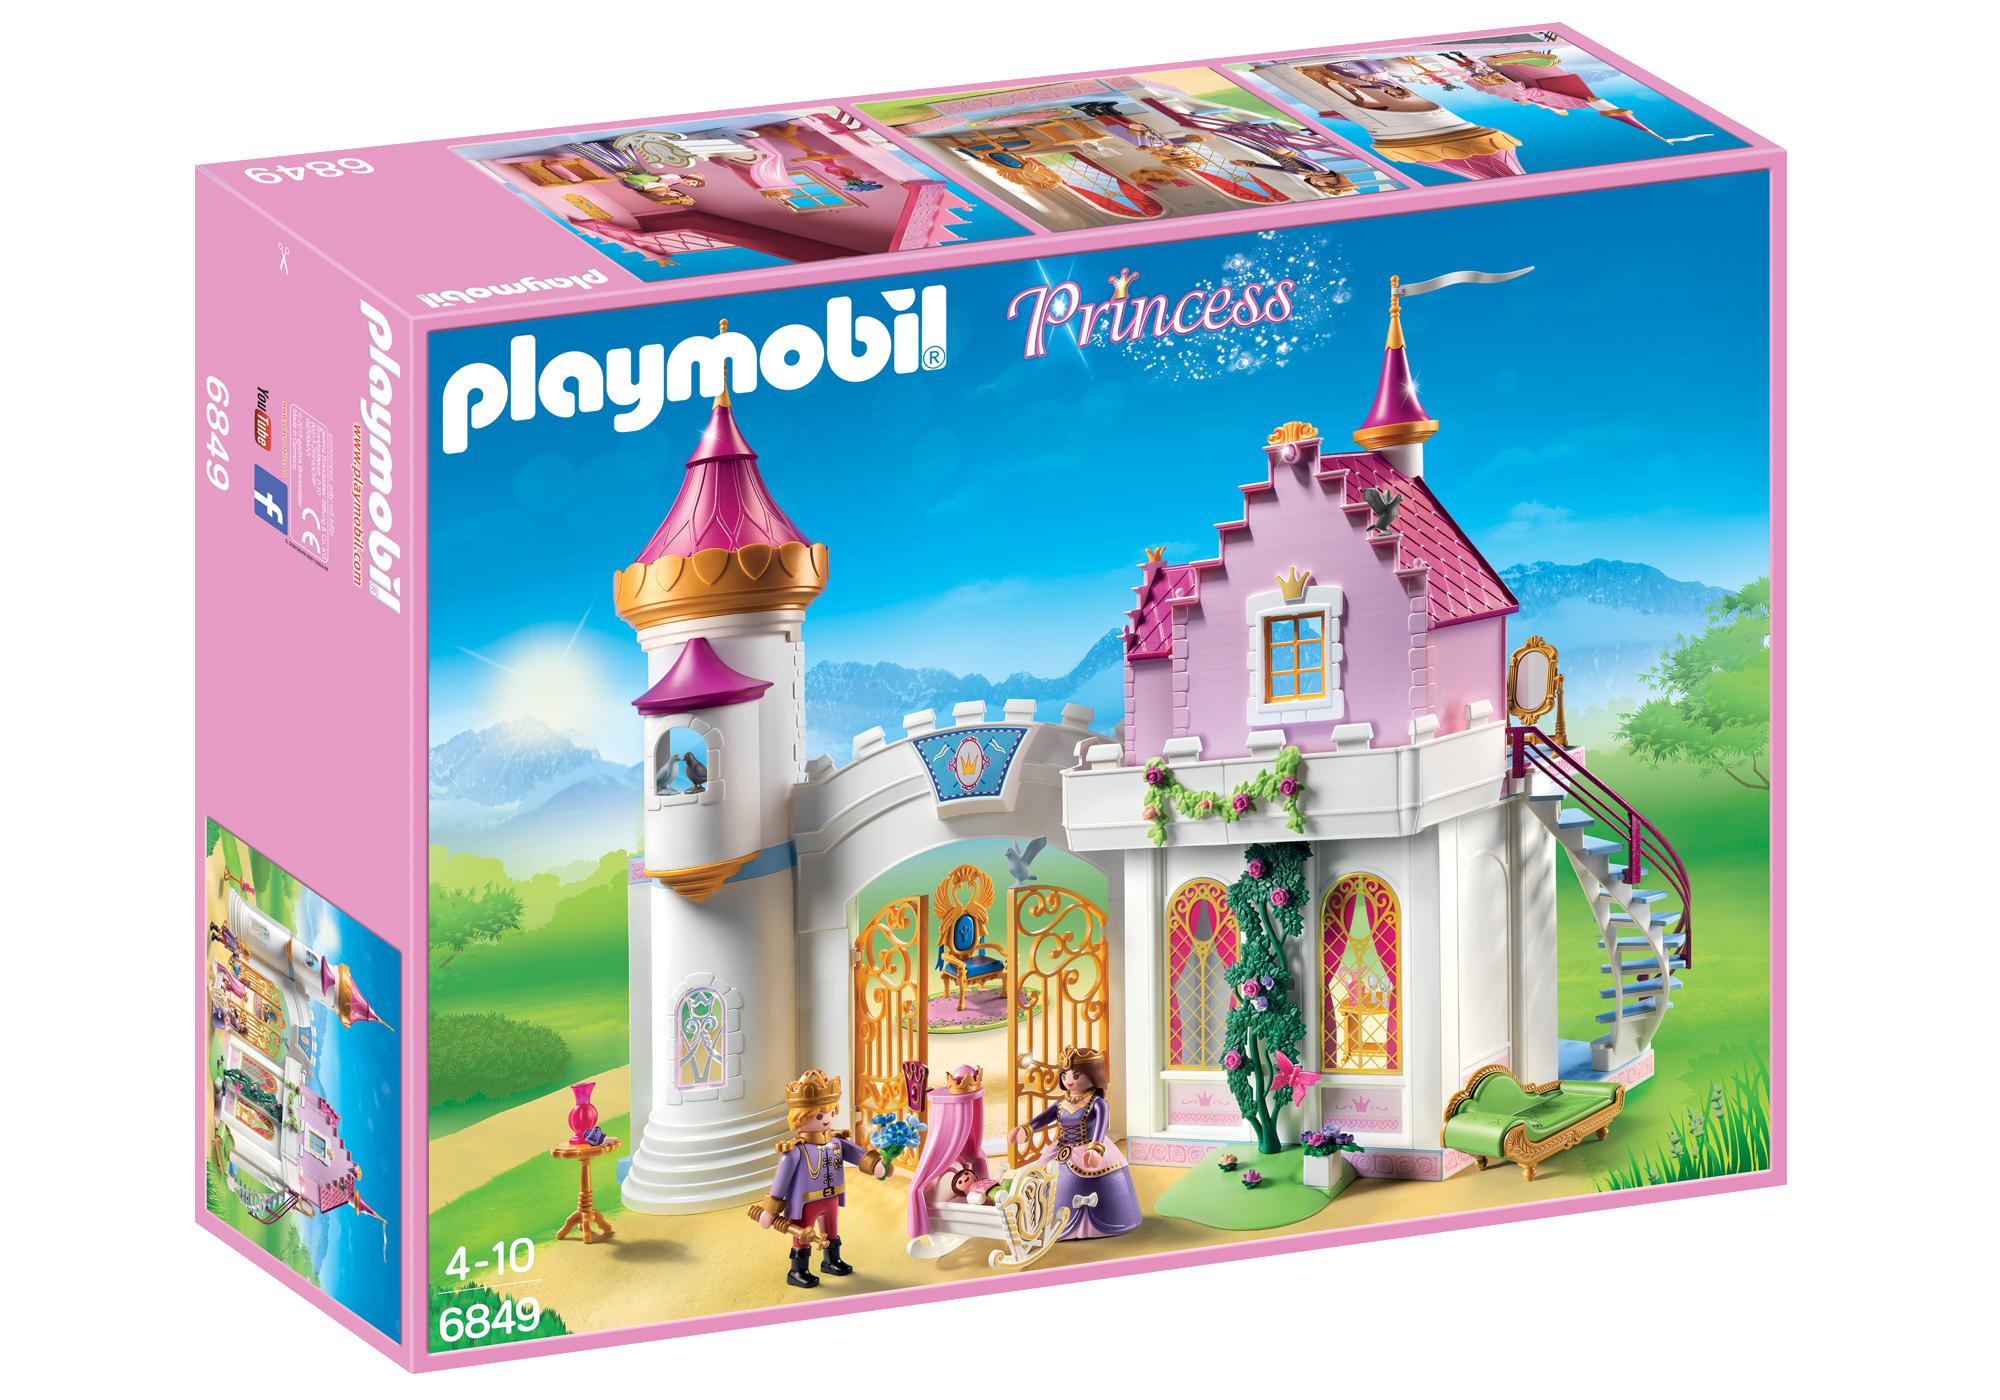 http://media.playmobil.com/i/playmobil/6849_product_box_front